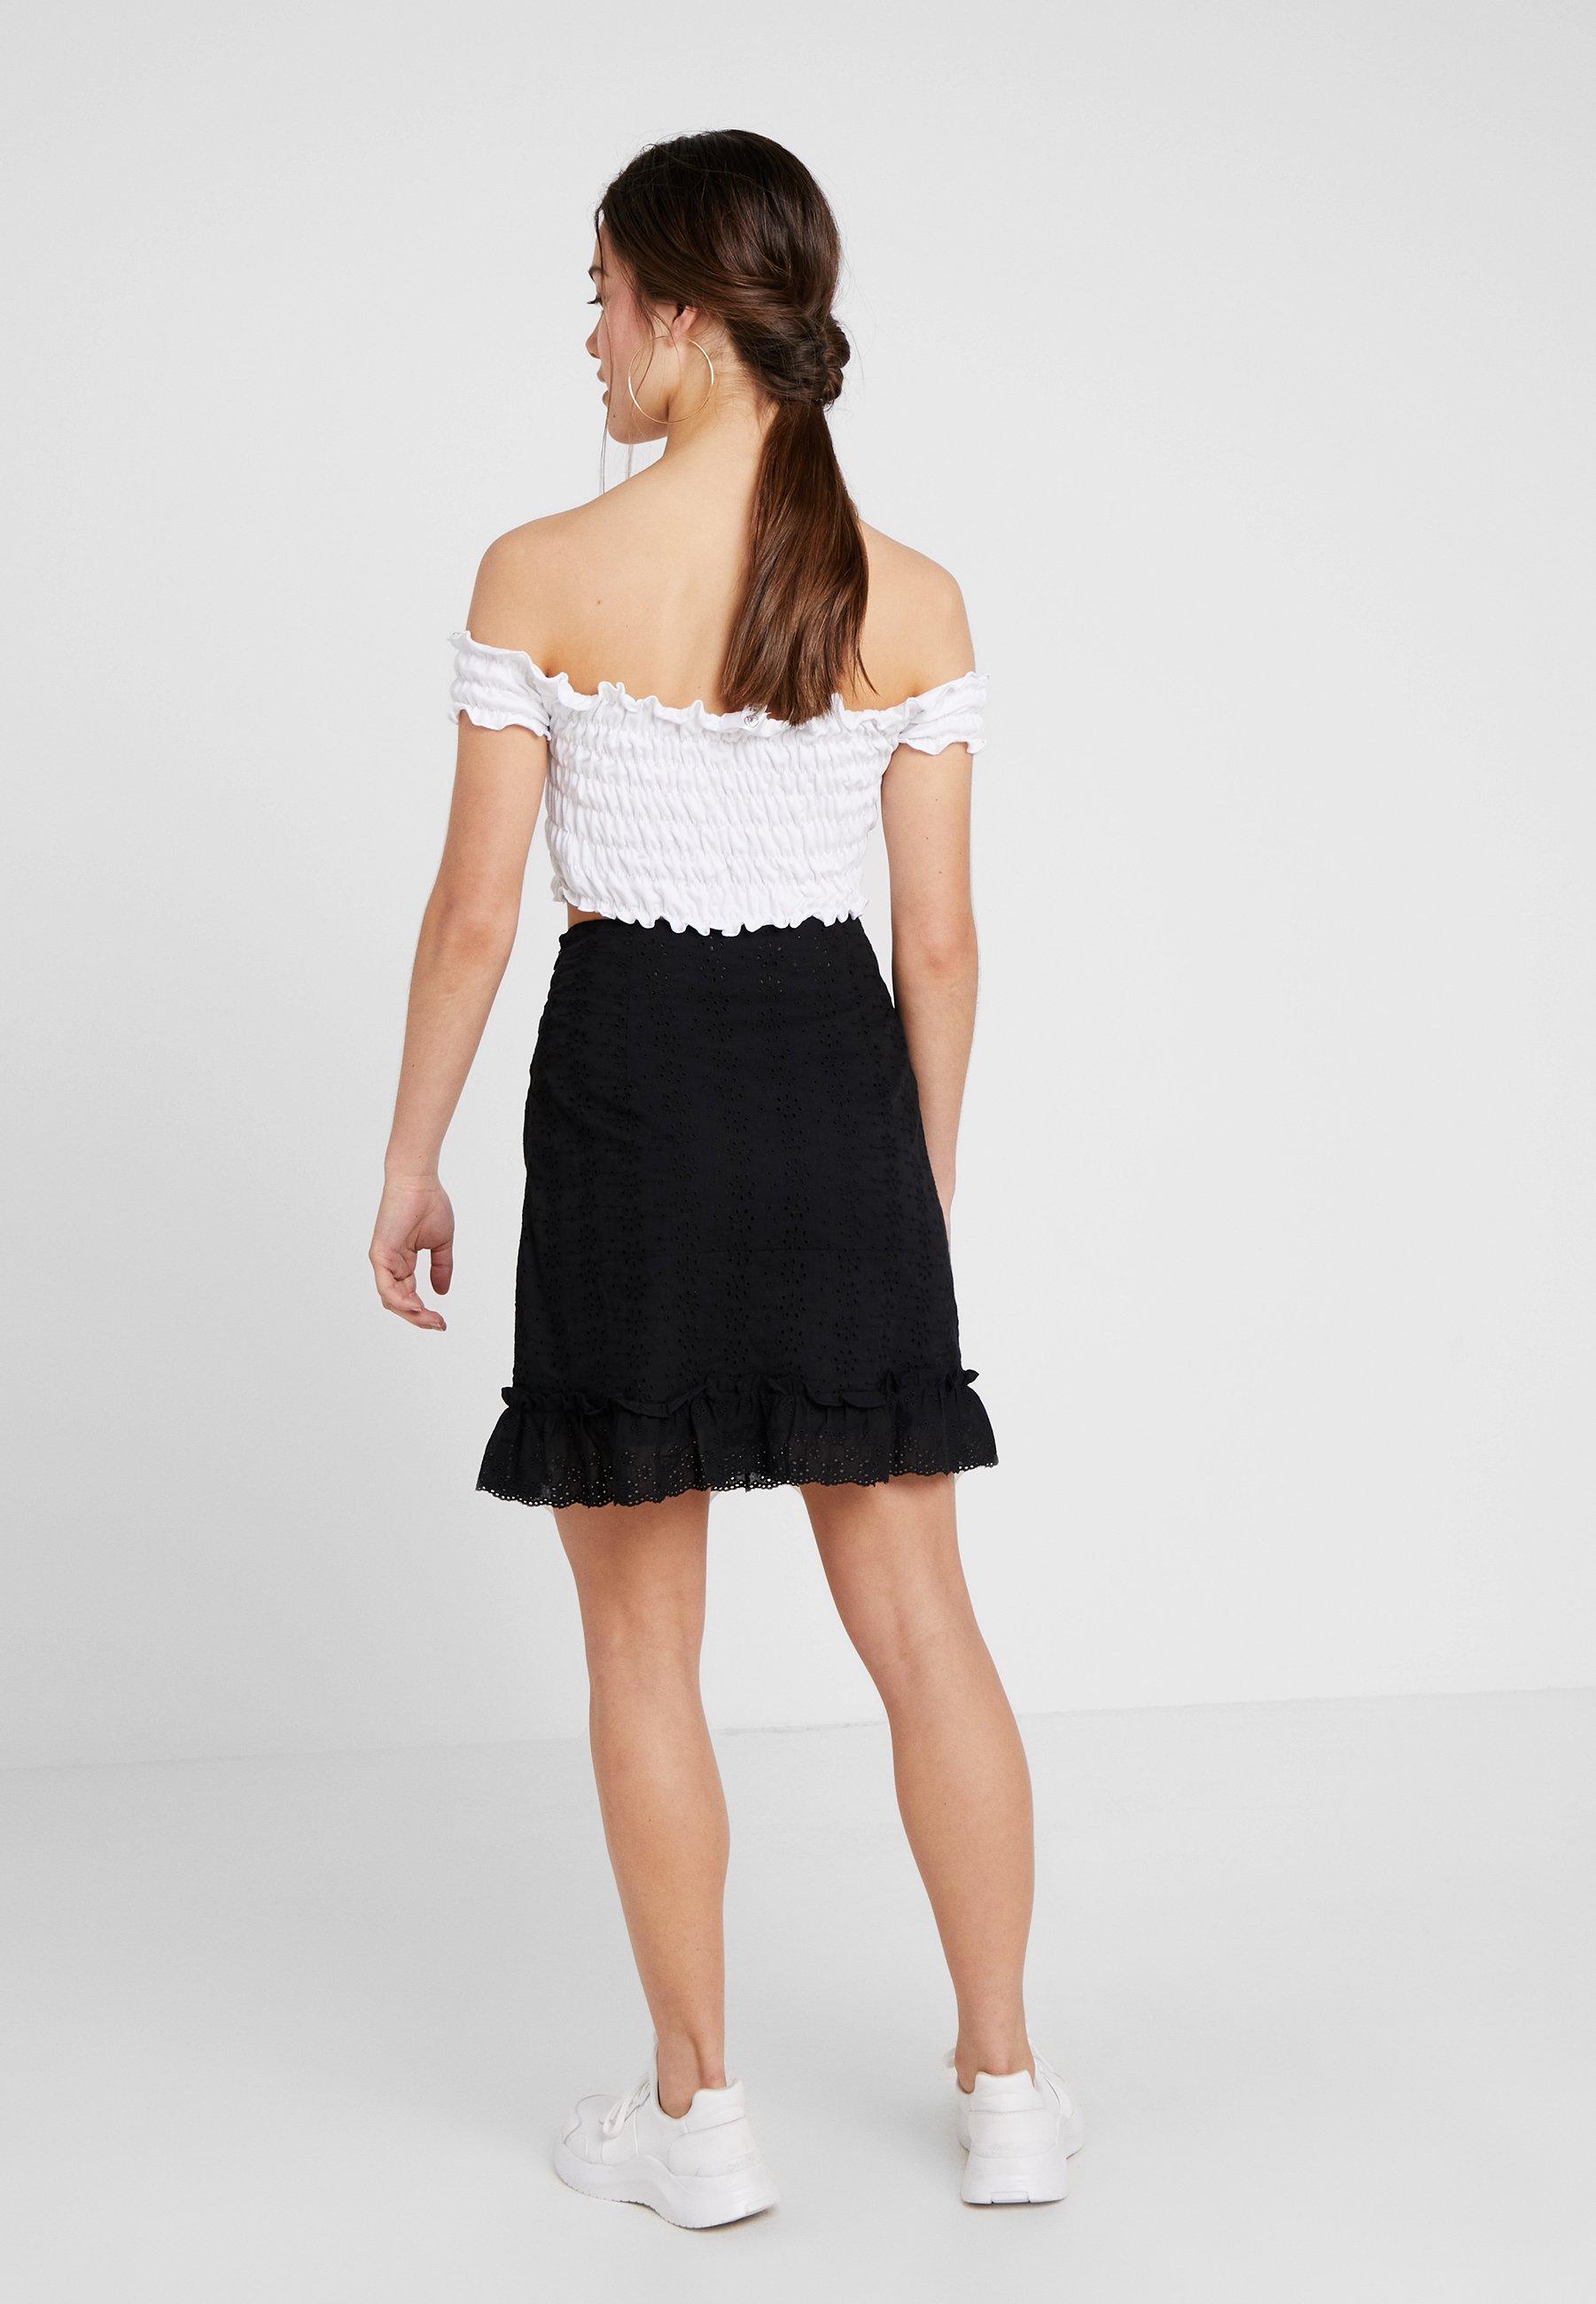 Petite Fashion Skirt HemJupe Black Mini Anglaise Union With Trapèze Frilled j4Lc35ASqR